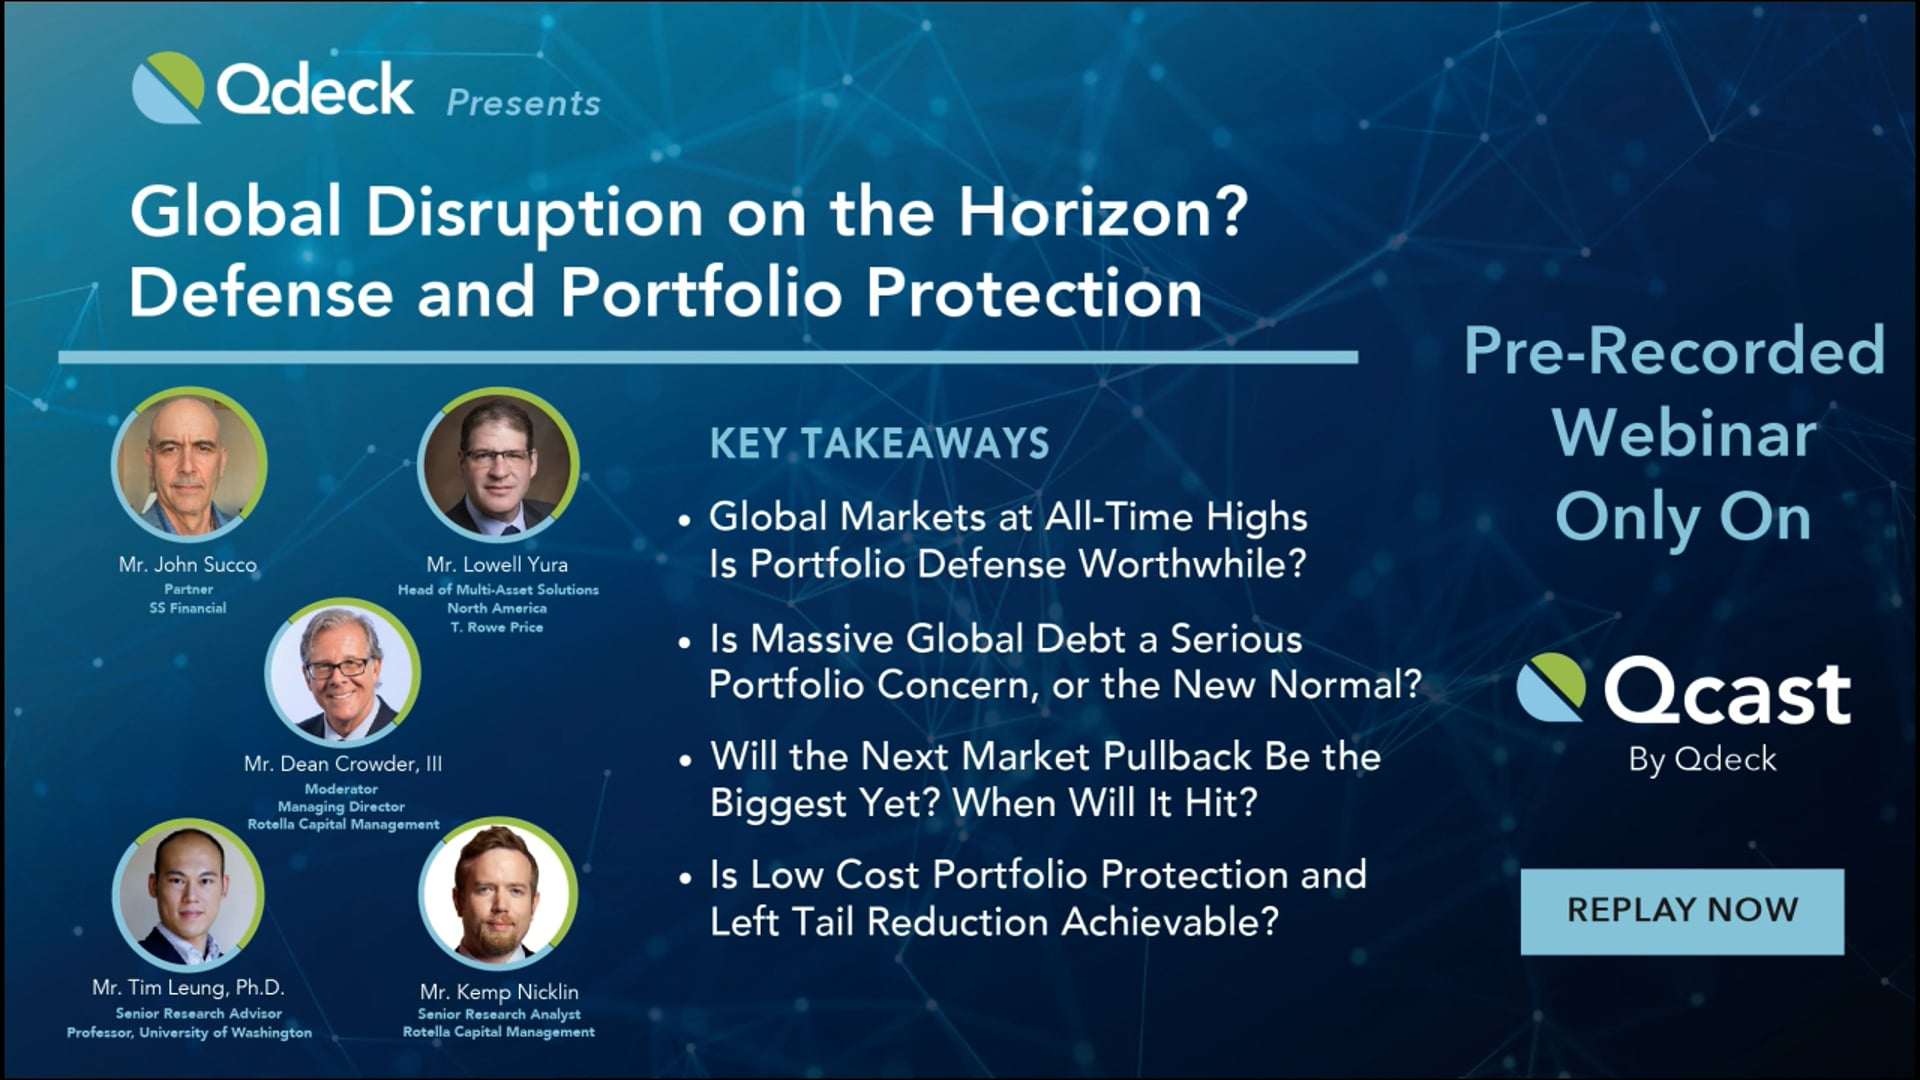 Global Disruption on the Horizon? Defense and Portfolio Protection